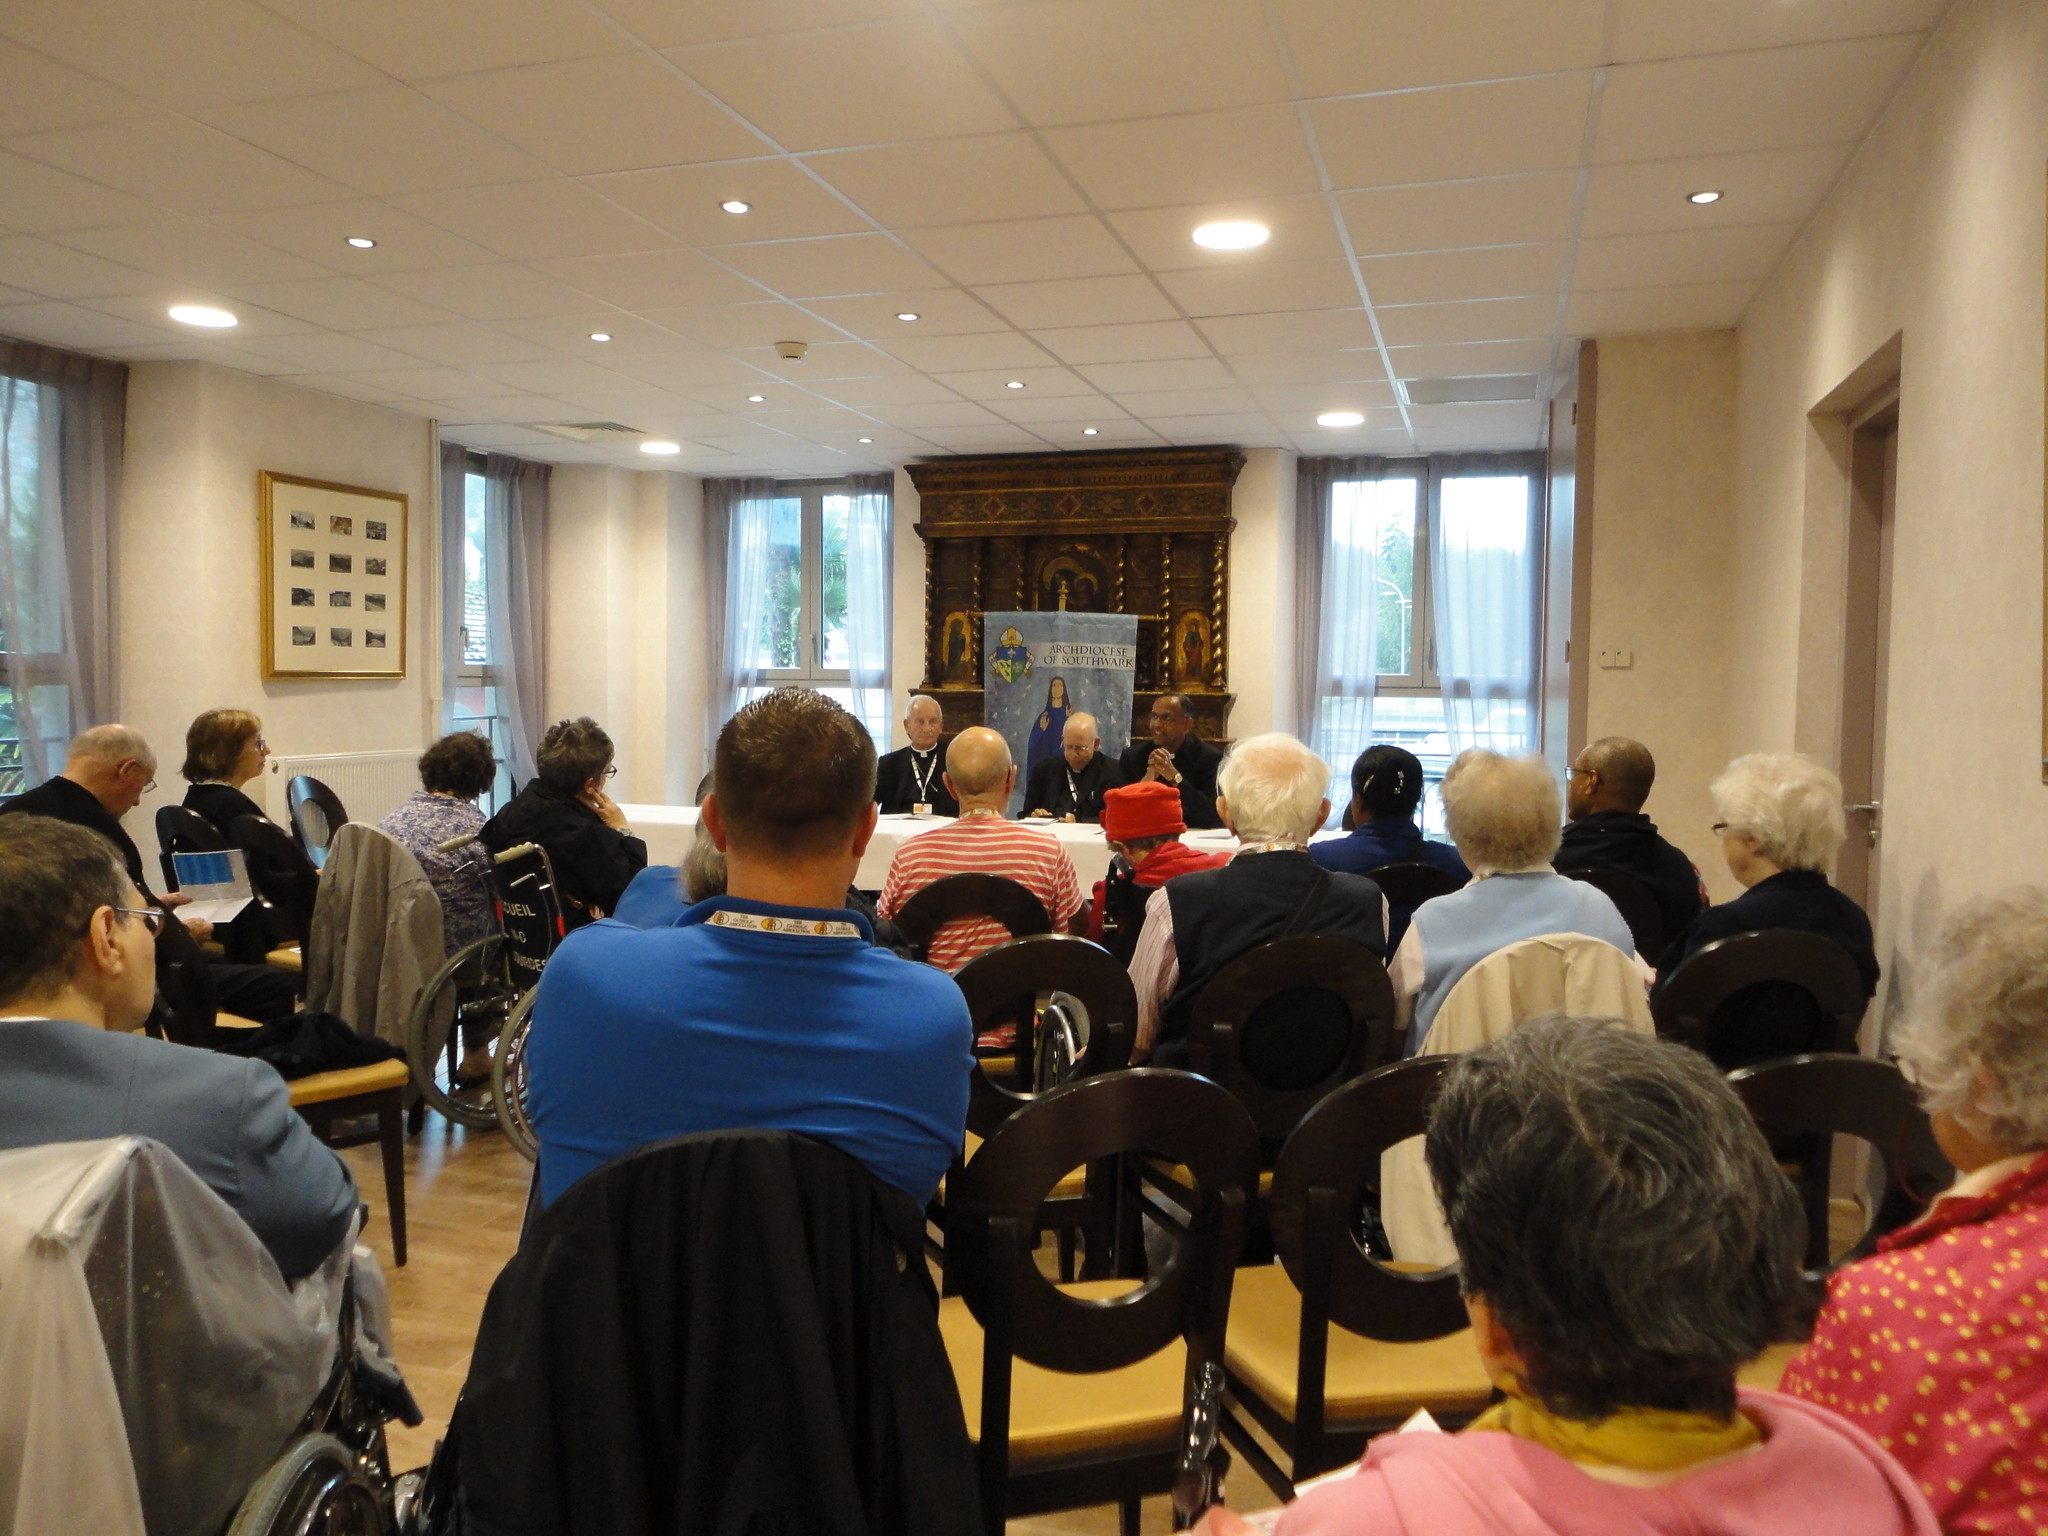 Southwark Pilgrims meeting